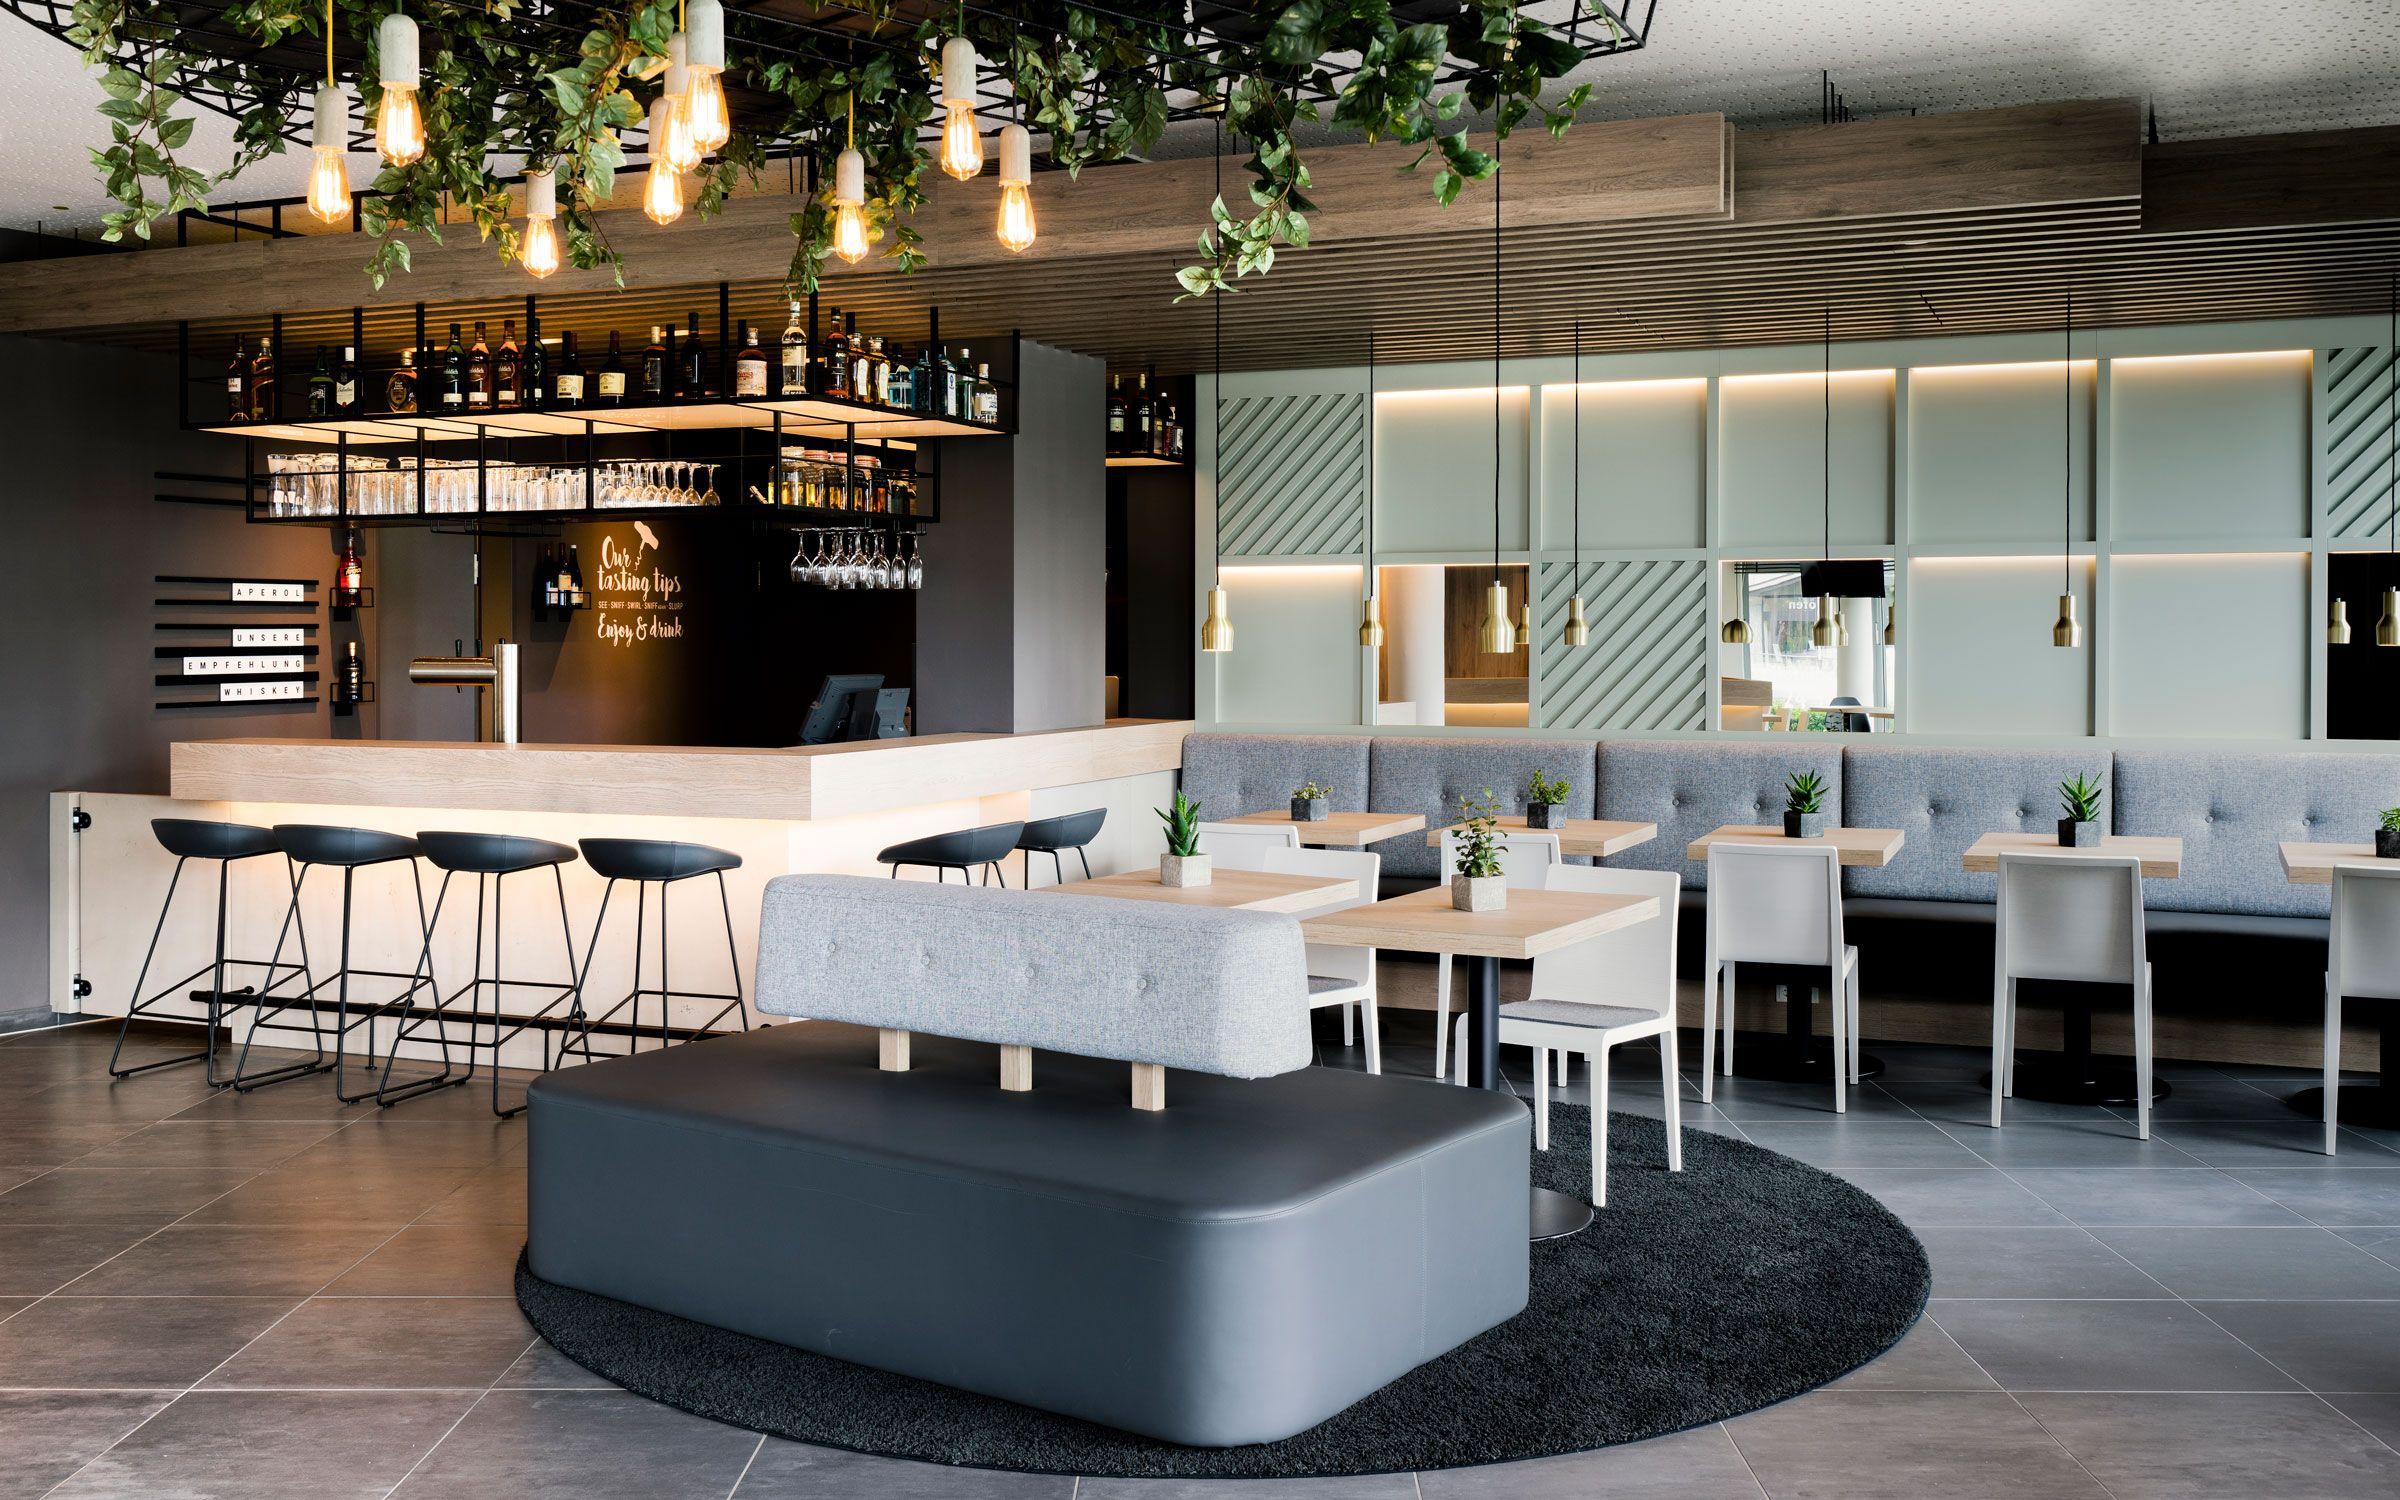 Interior Design, Architecture Acomhotel M Nchen By Dia  Dittel